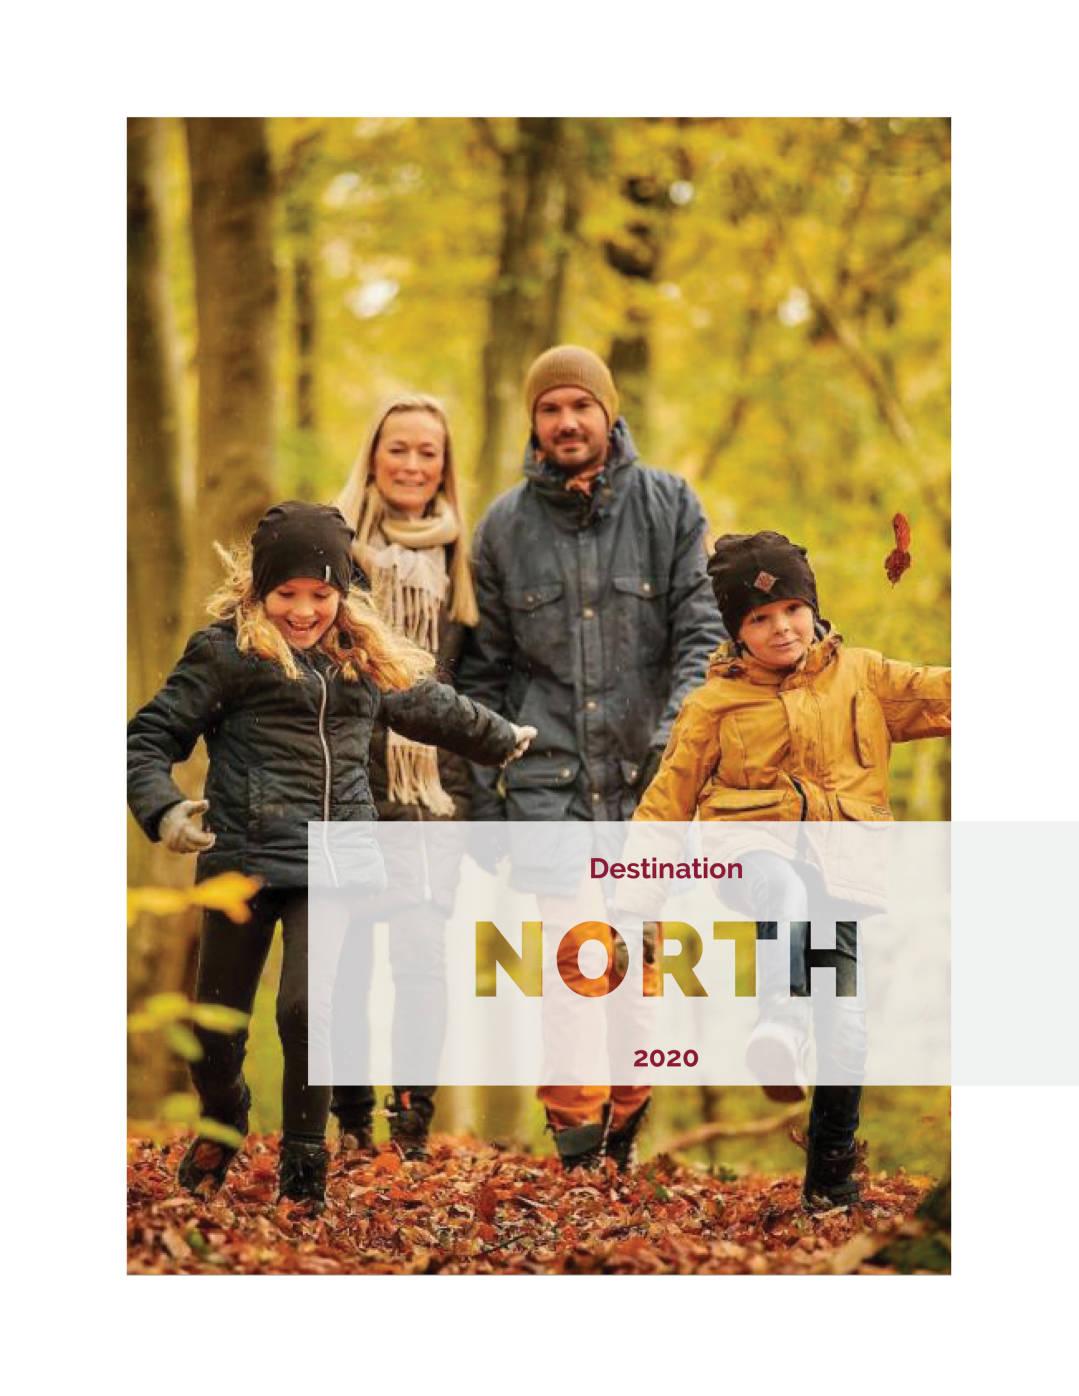 destination_nord_nyt-design.jpg